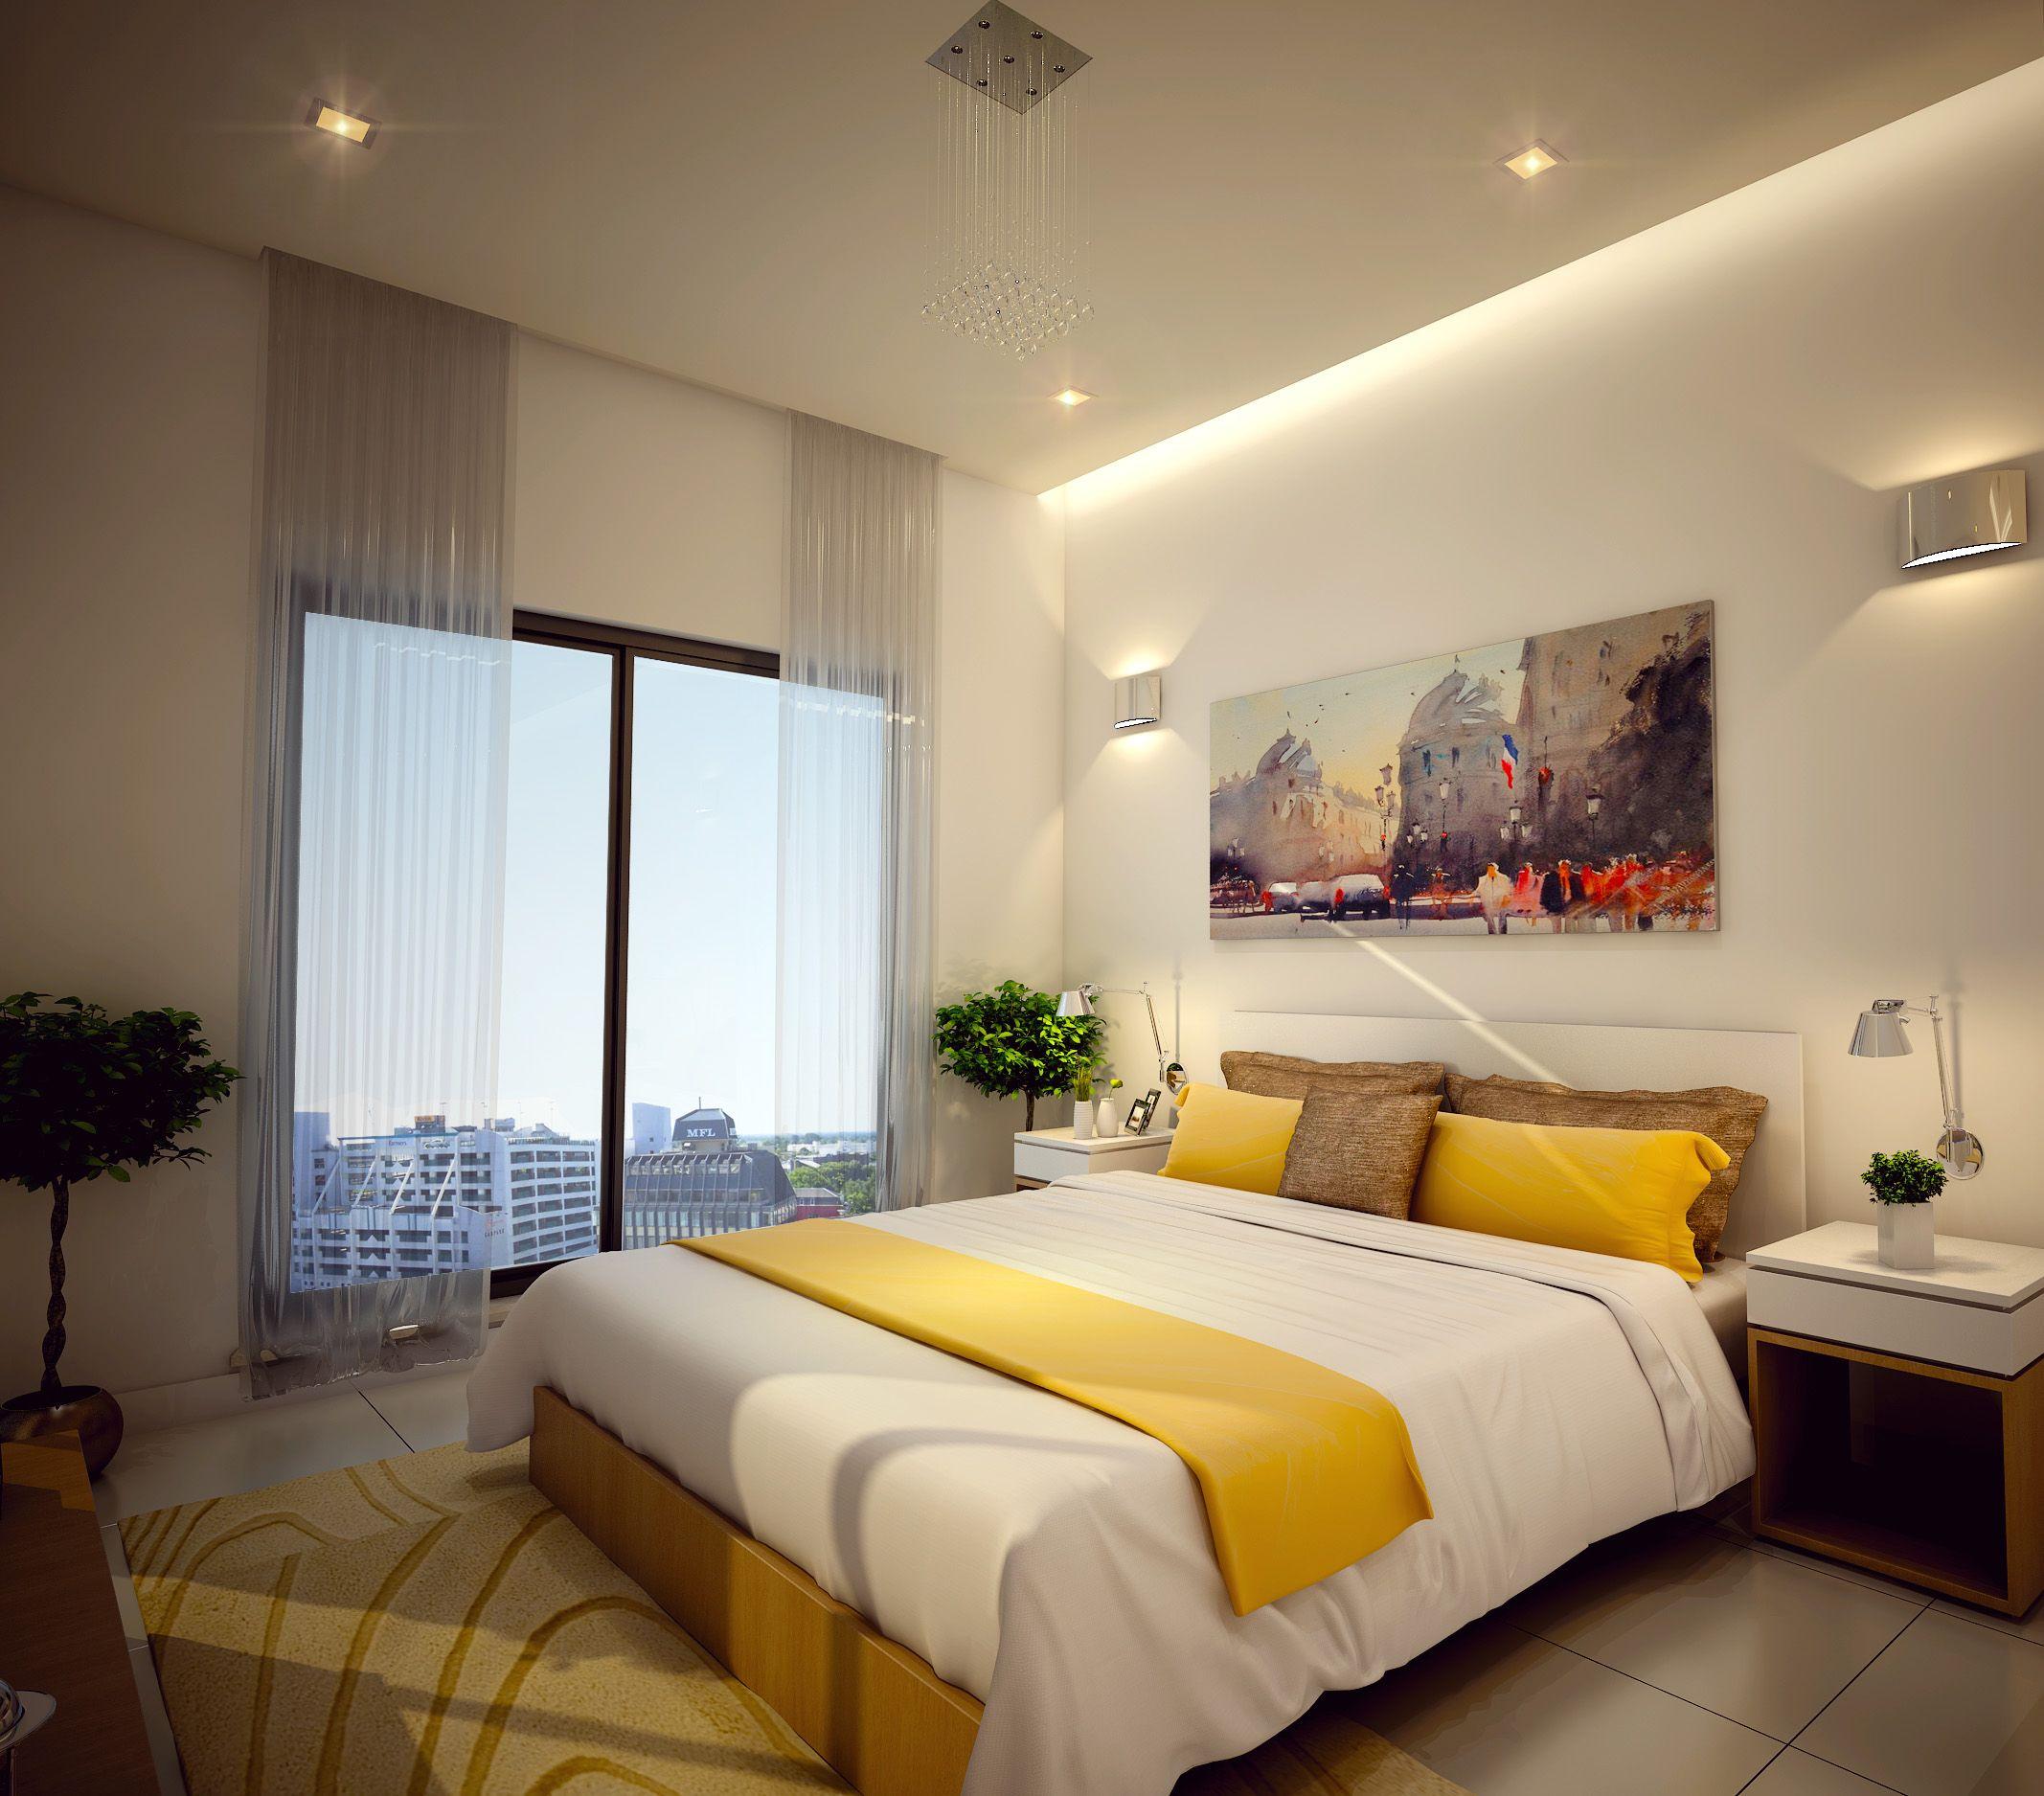 One Bedroom Luxury Apartment at 64L One Bedroom Luxury